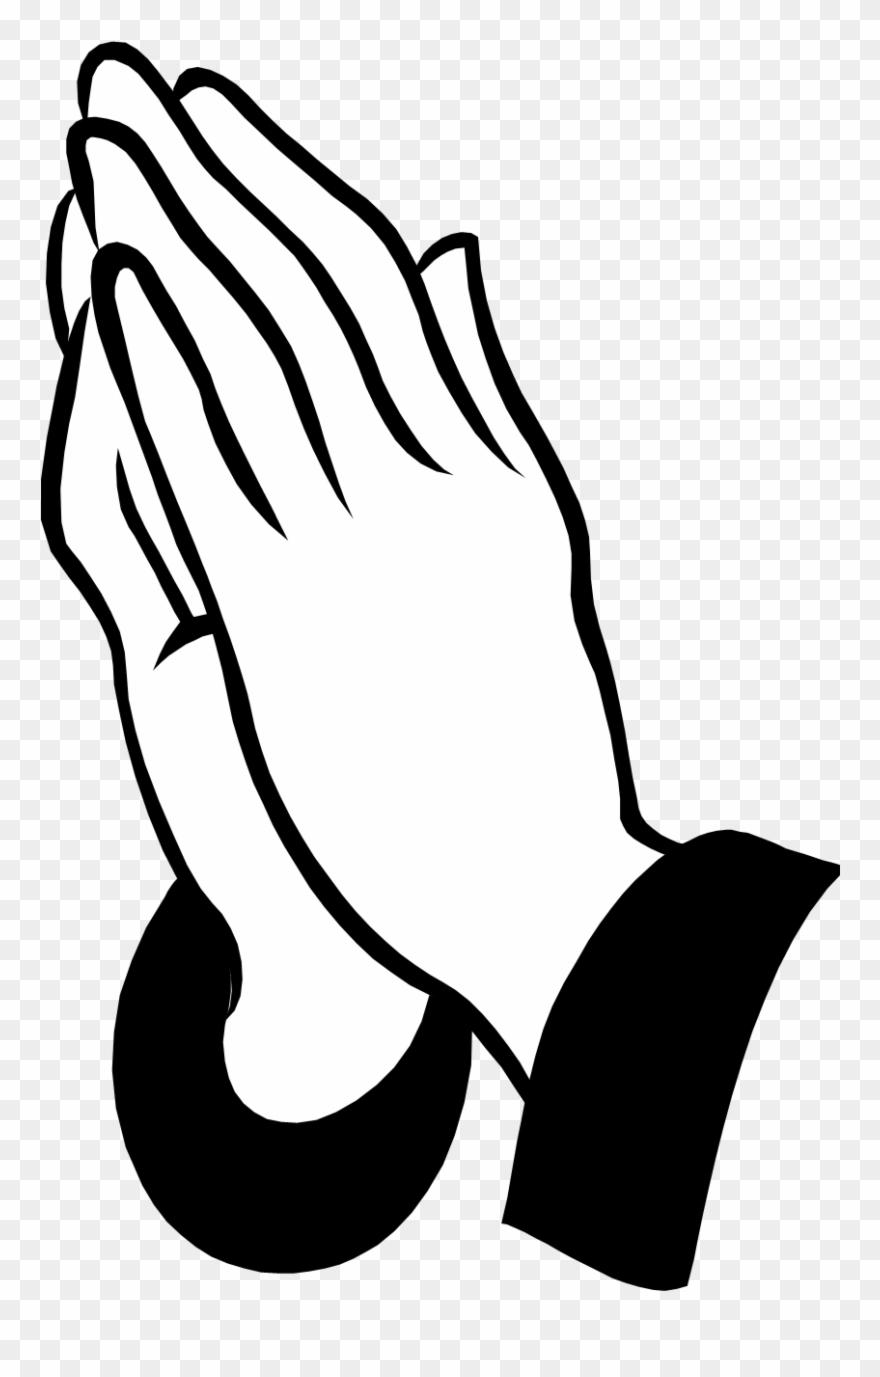 Pray request praying hands. Funeral clipart prayer